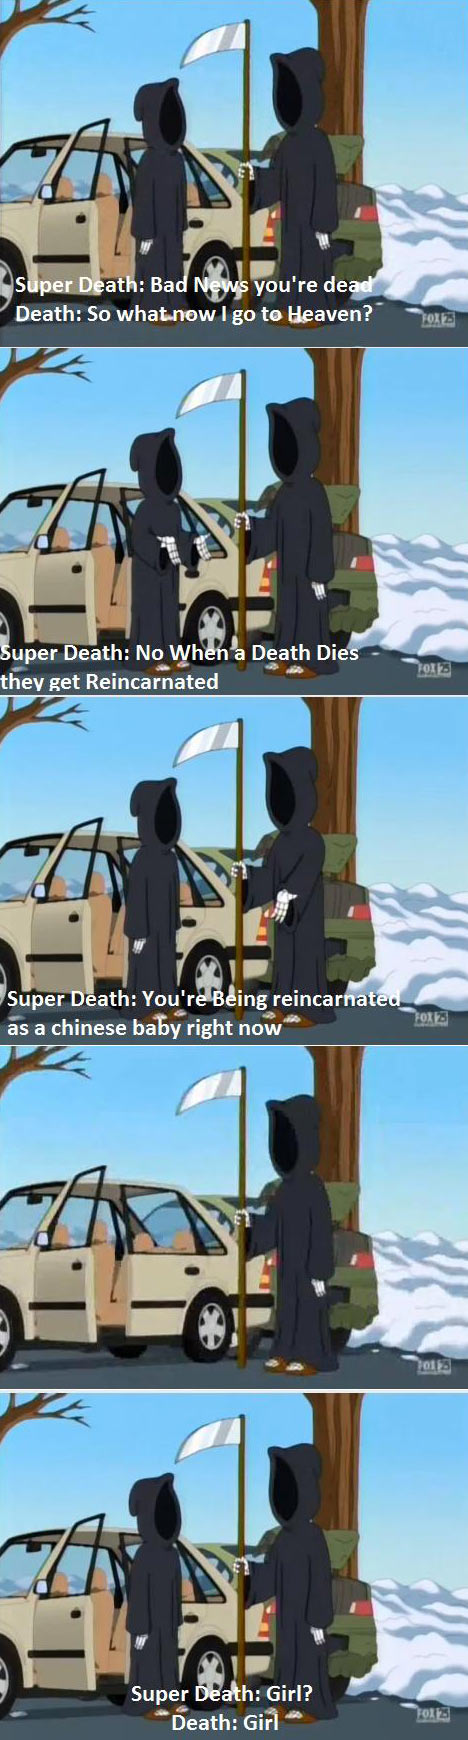 What happens when Death dies…